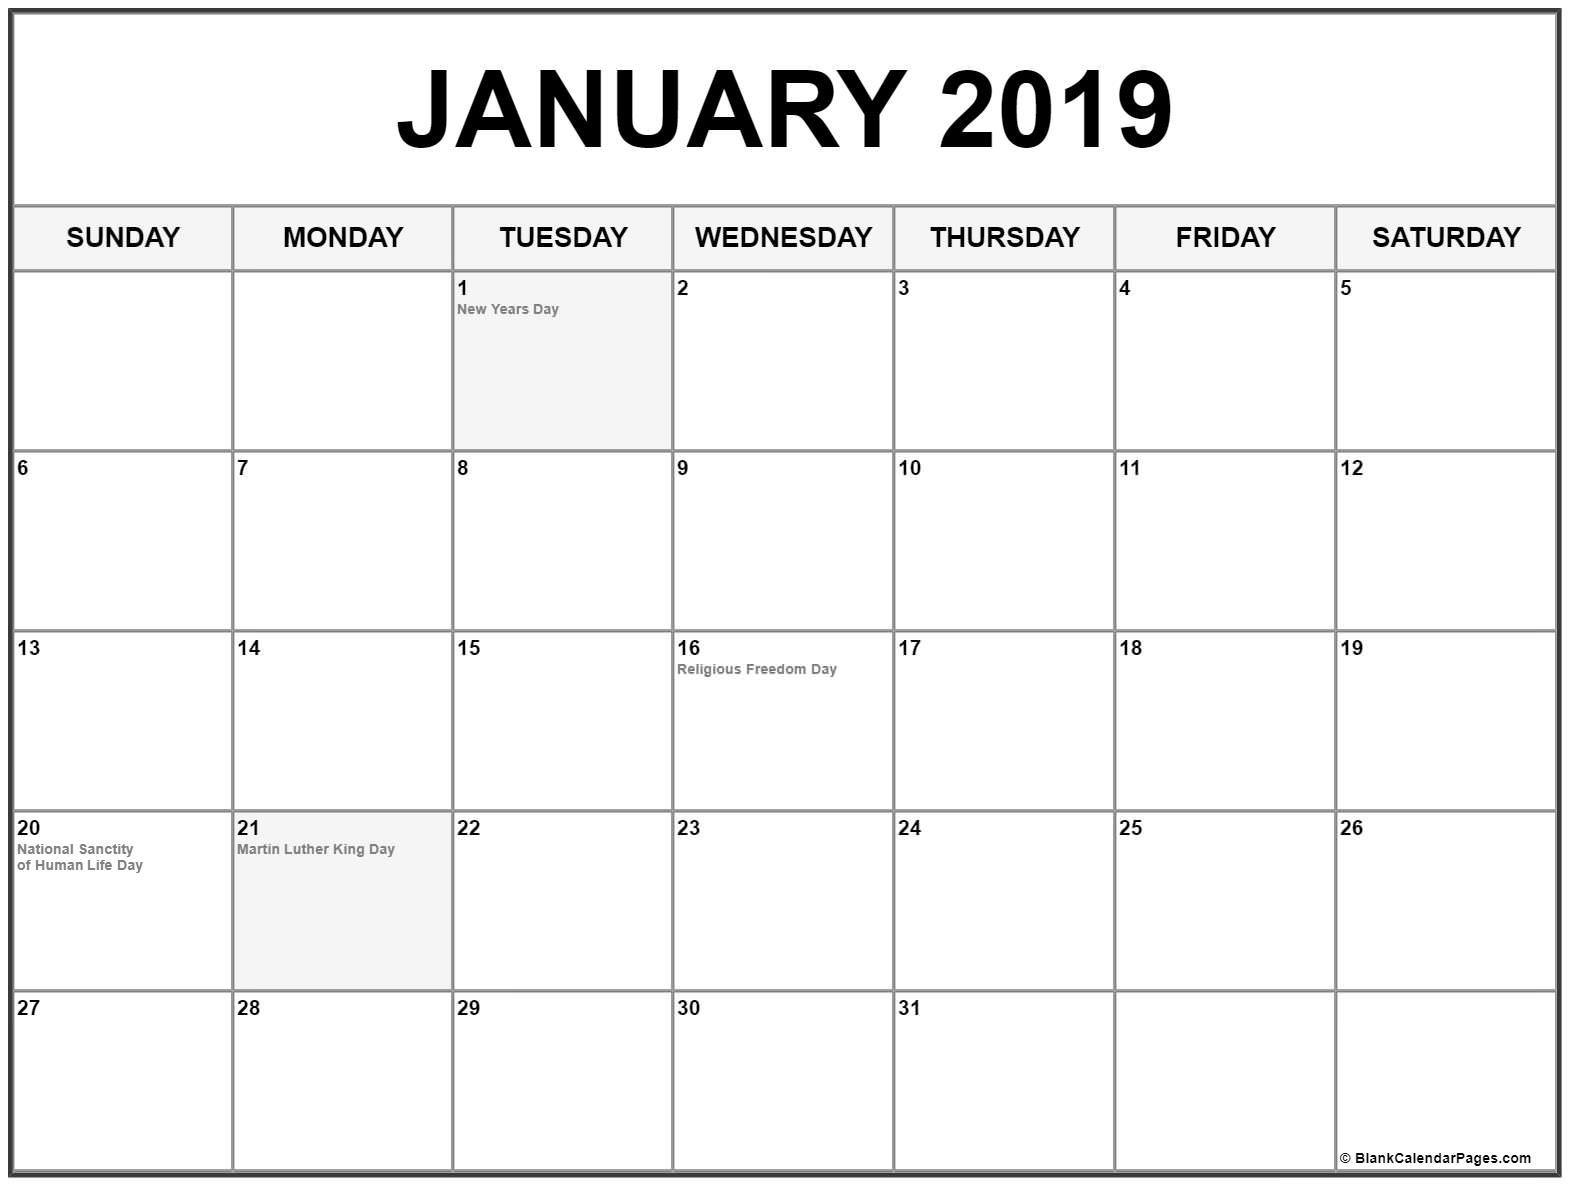 January 2019 Calendar With Holidays | Holiday Calendars | January regarding Editable October 2019 Calendar With Religious Holidays